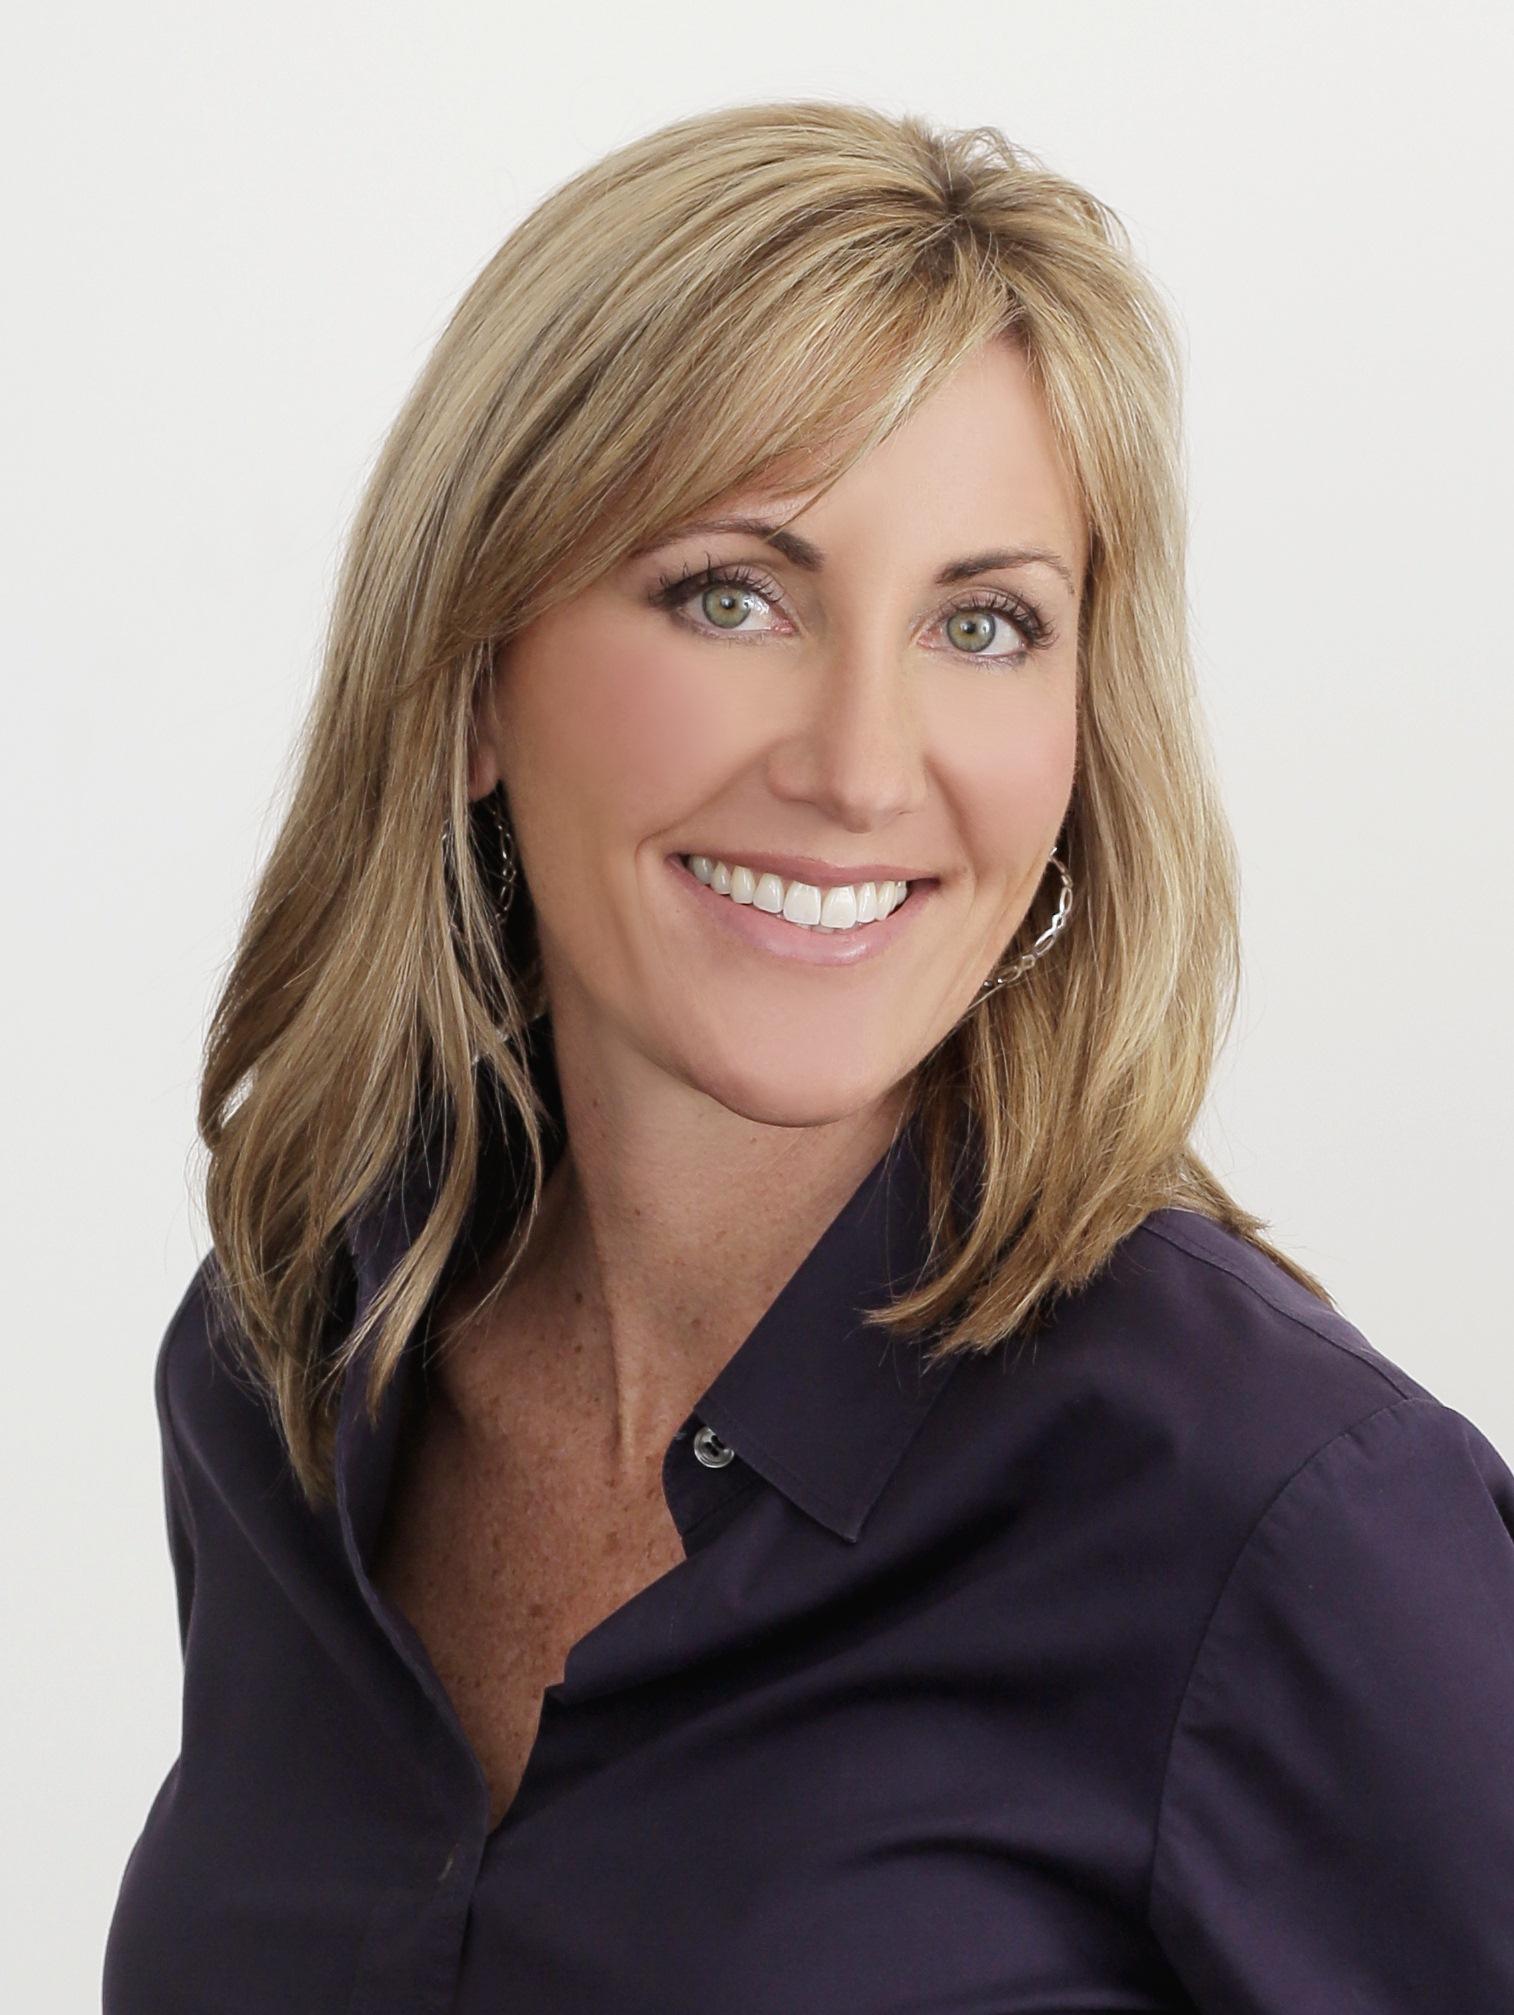 Stephanie Morris